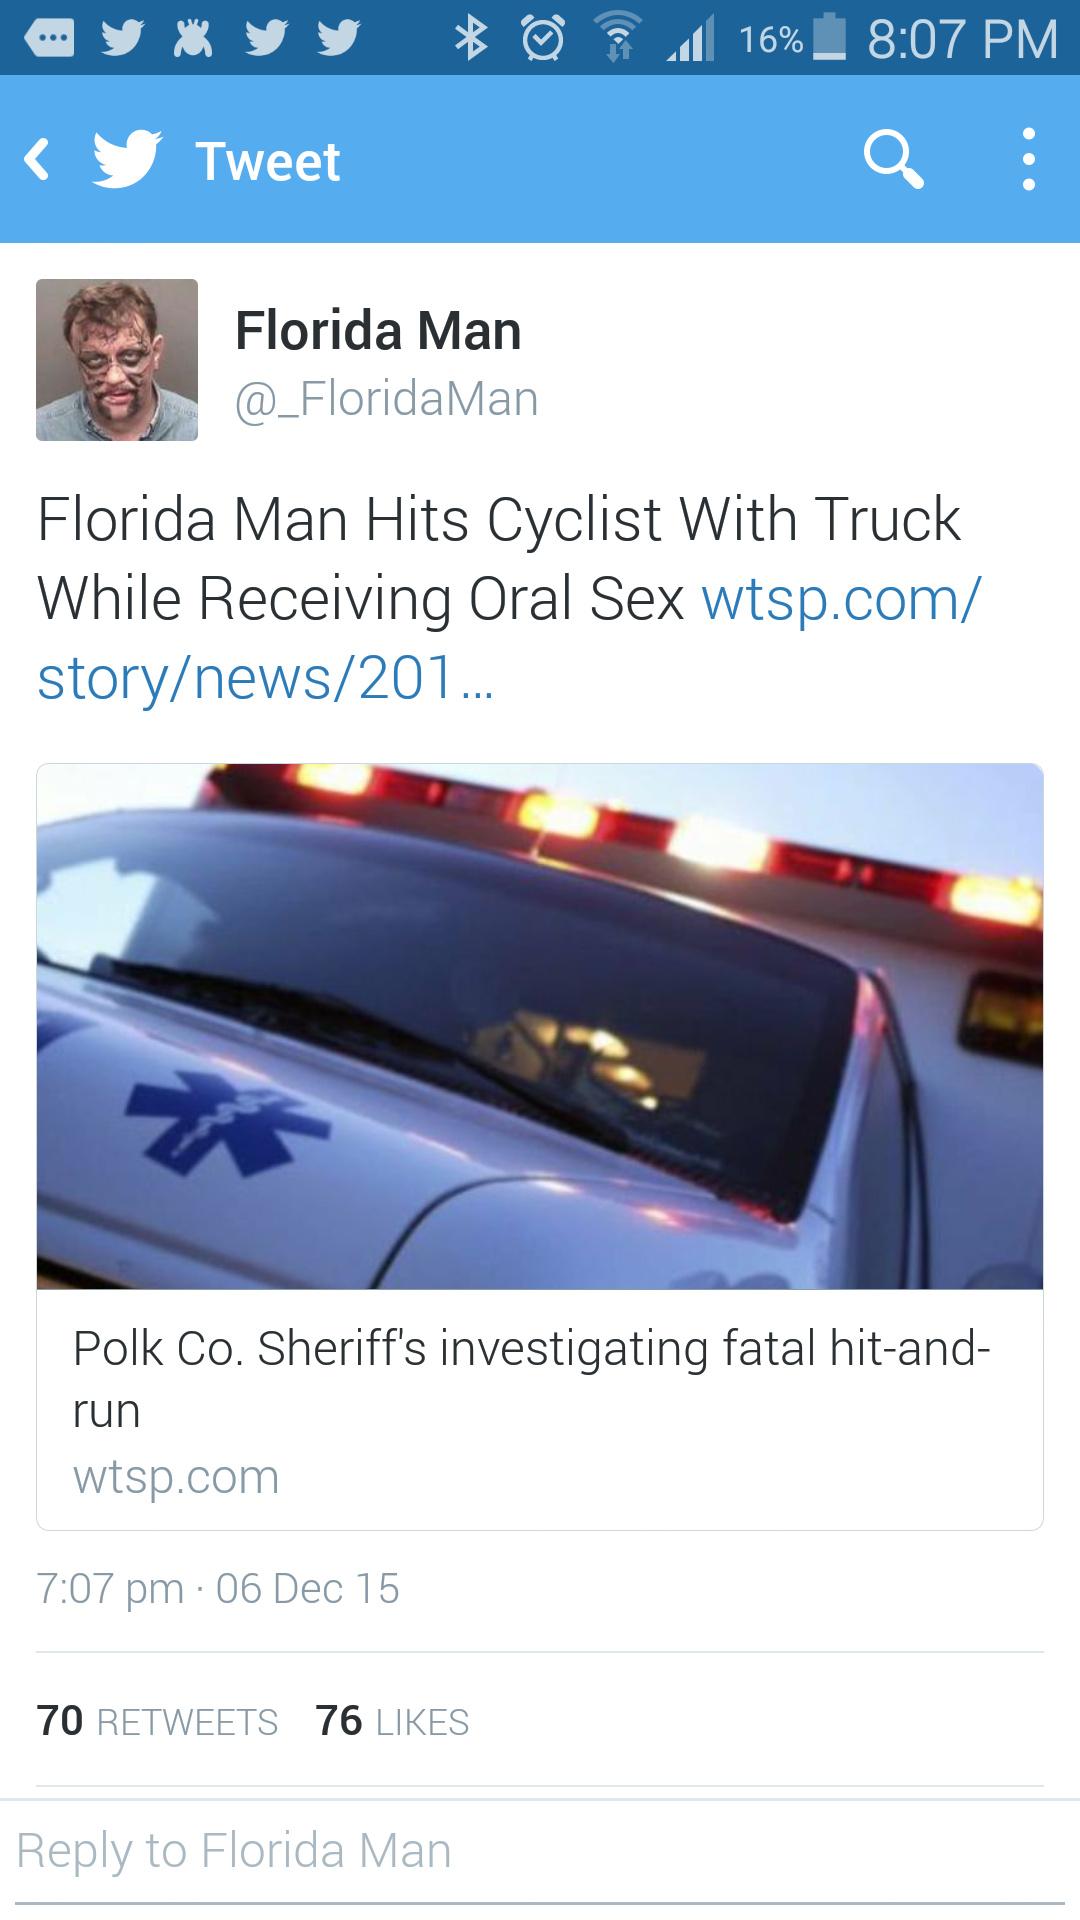 Florida man strikes again! - meme